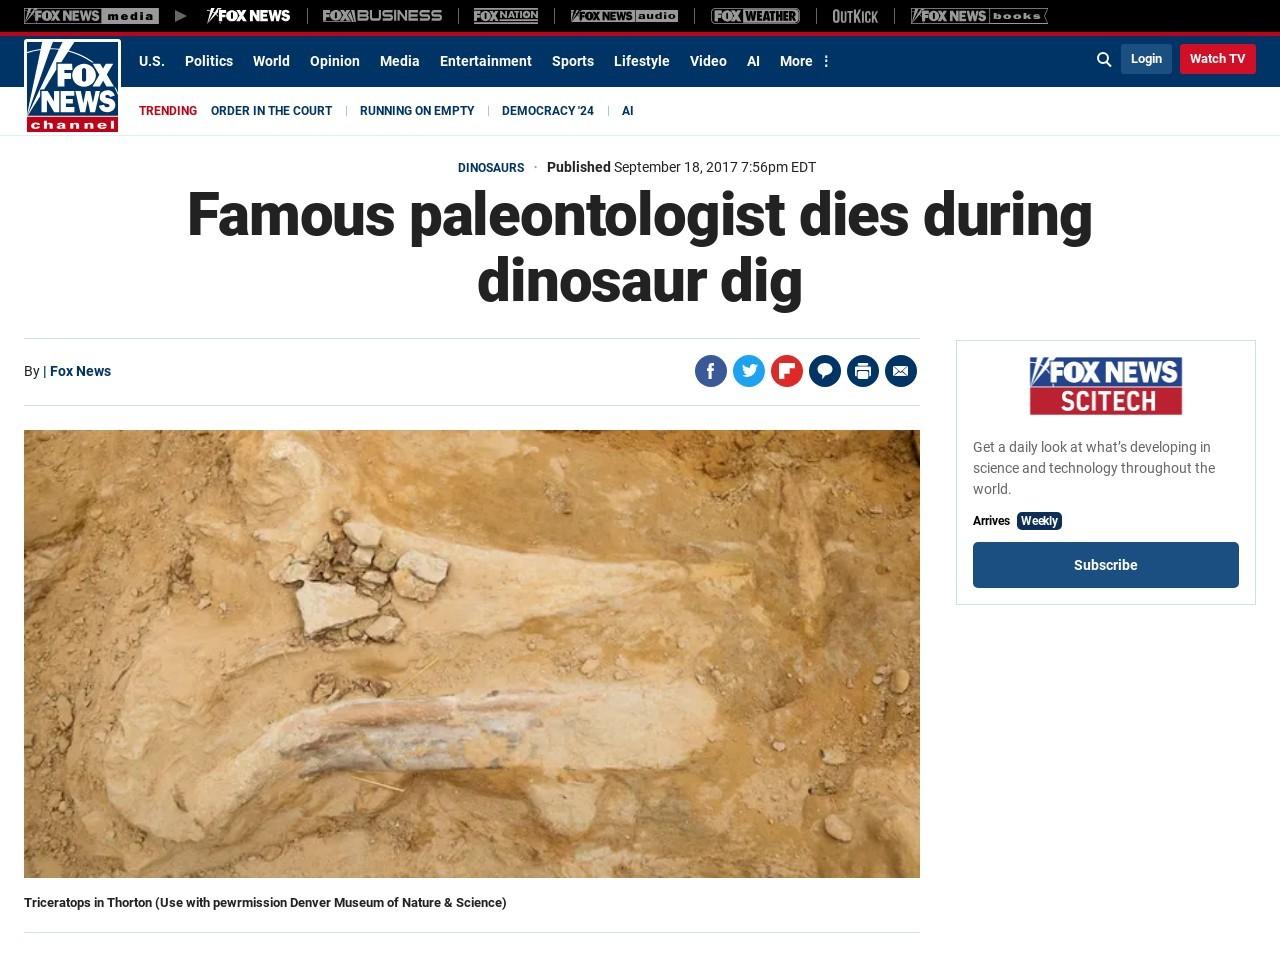 Famous paleontologist dies during dinosaur dig